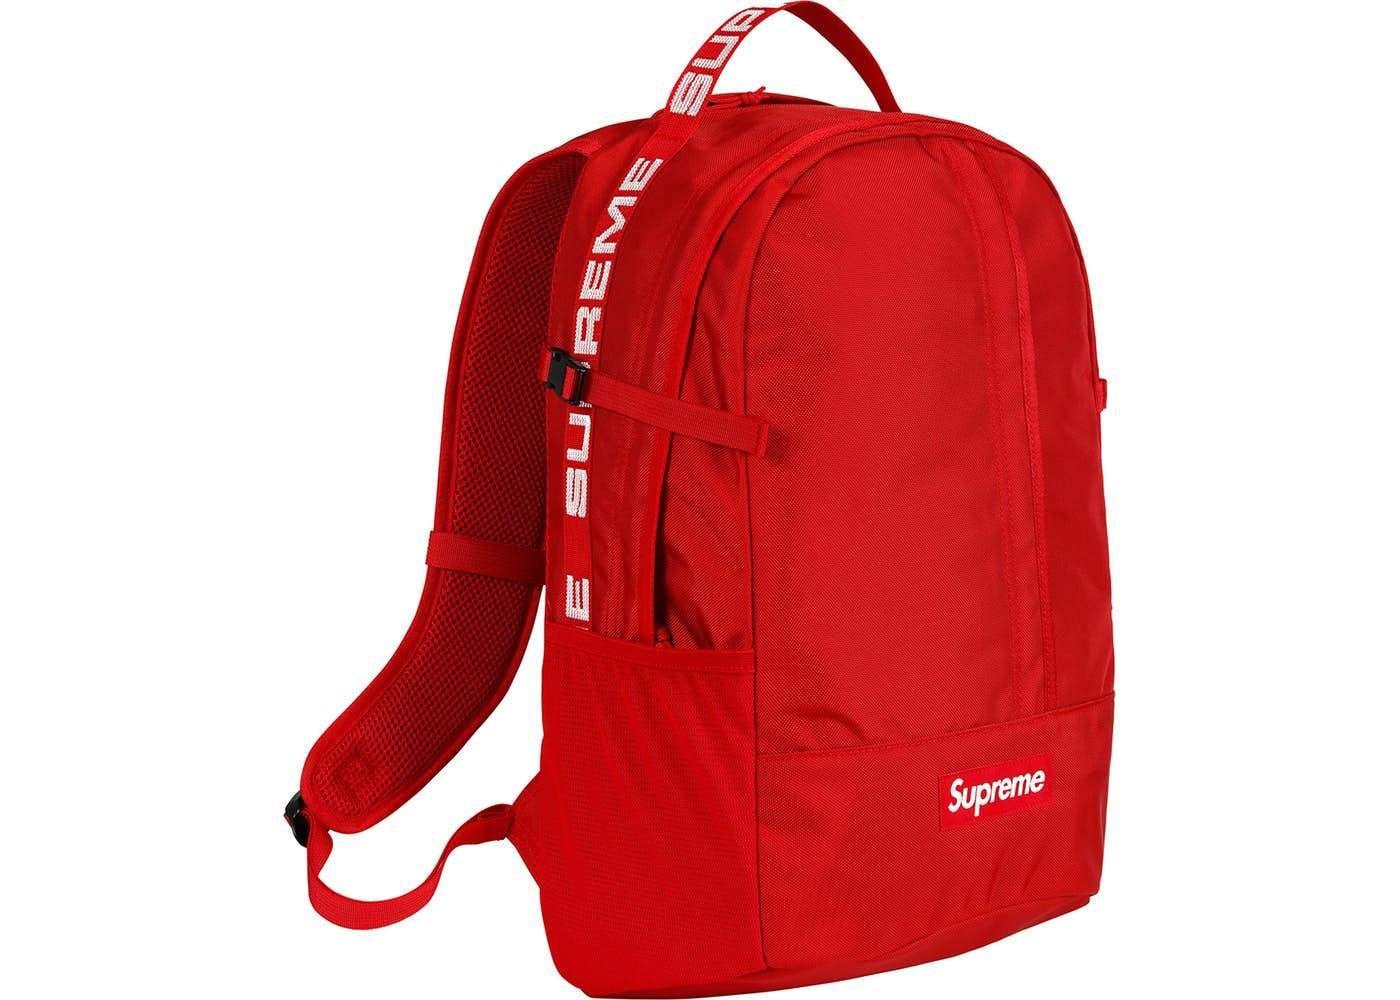 1d3226a152 Supreme SS18 Backpack | Boys Bedroom Ideas | Supreme backpack ...